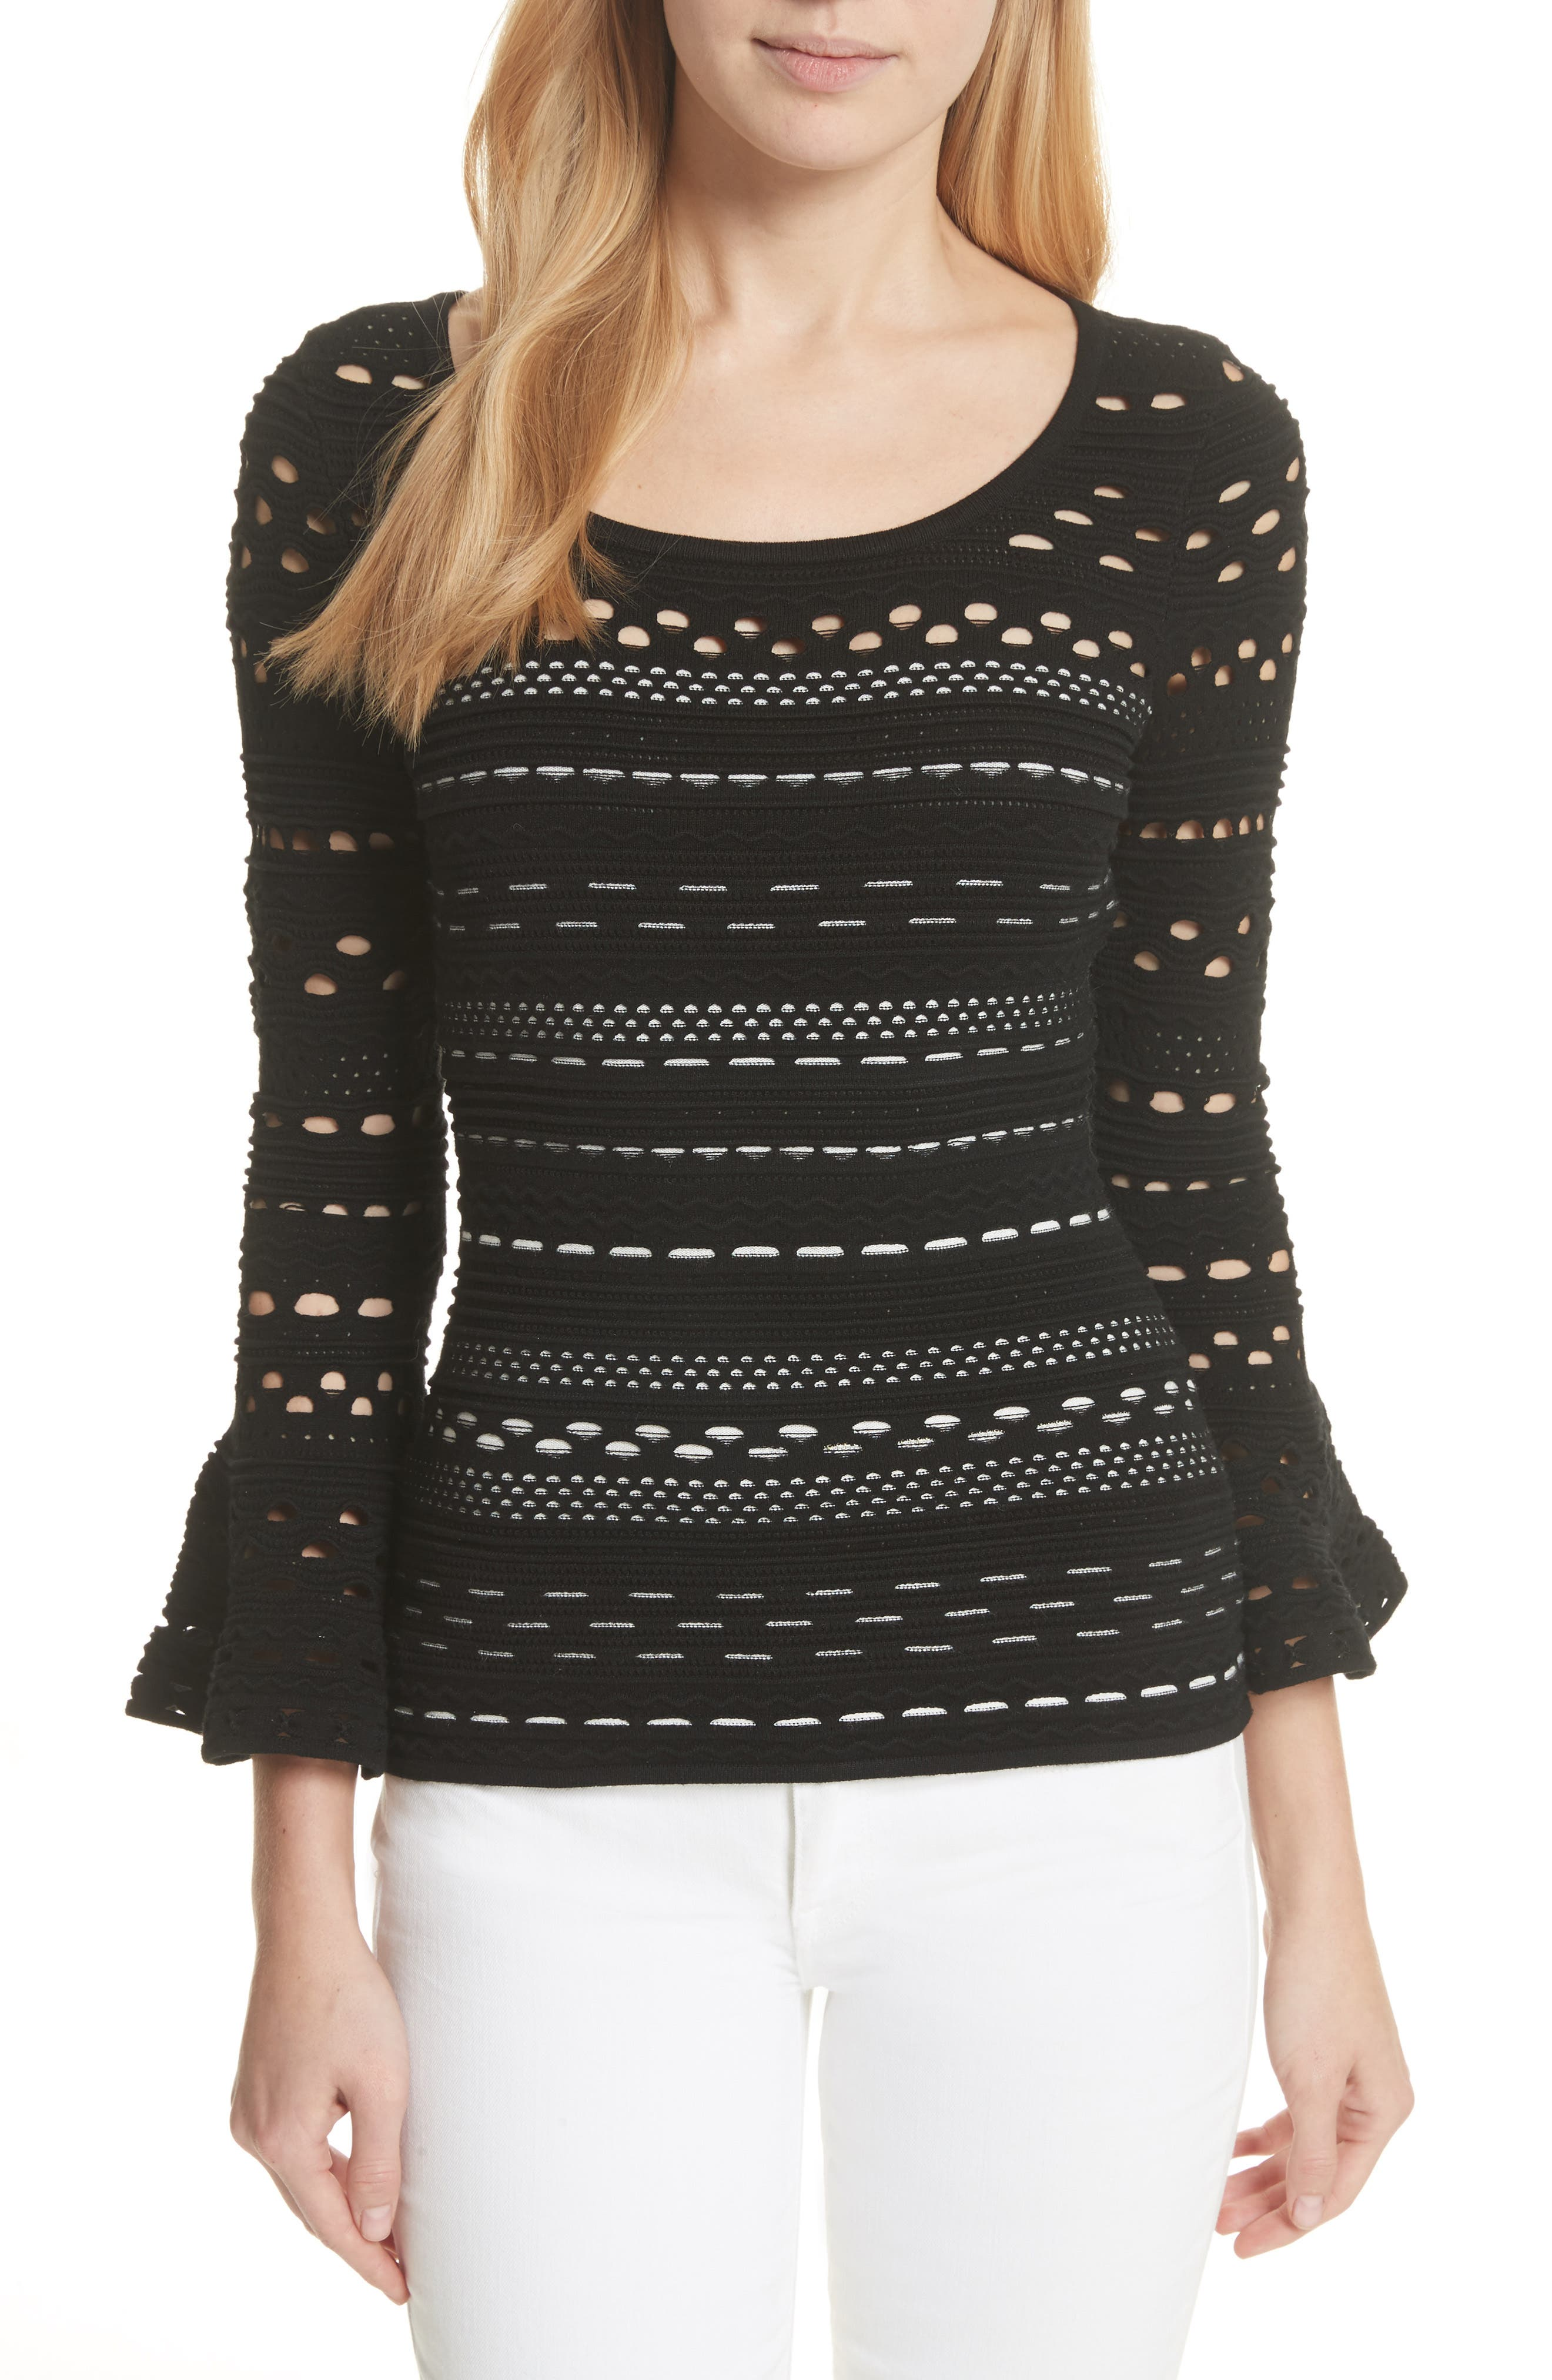 Lace Knit Top,                             Main thumbnail 1, color,                             Black/ White